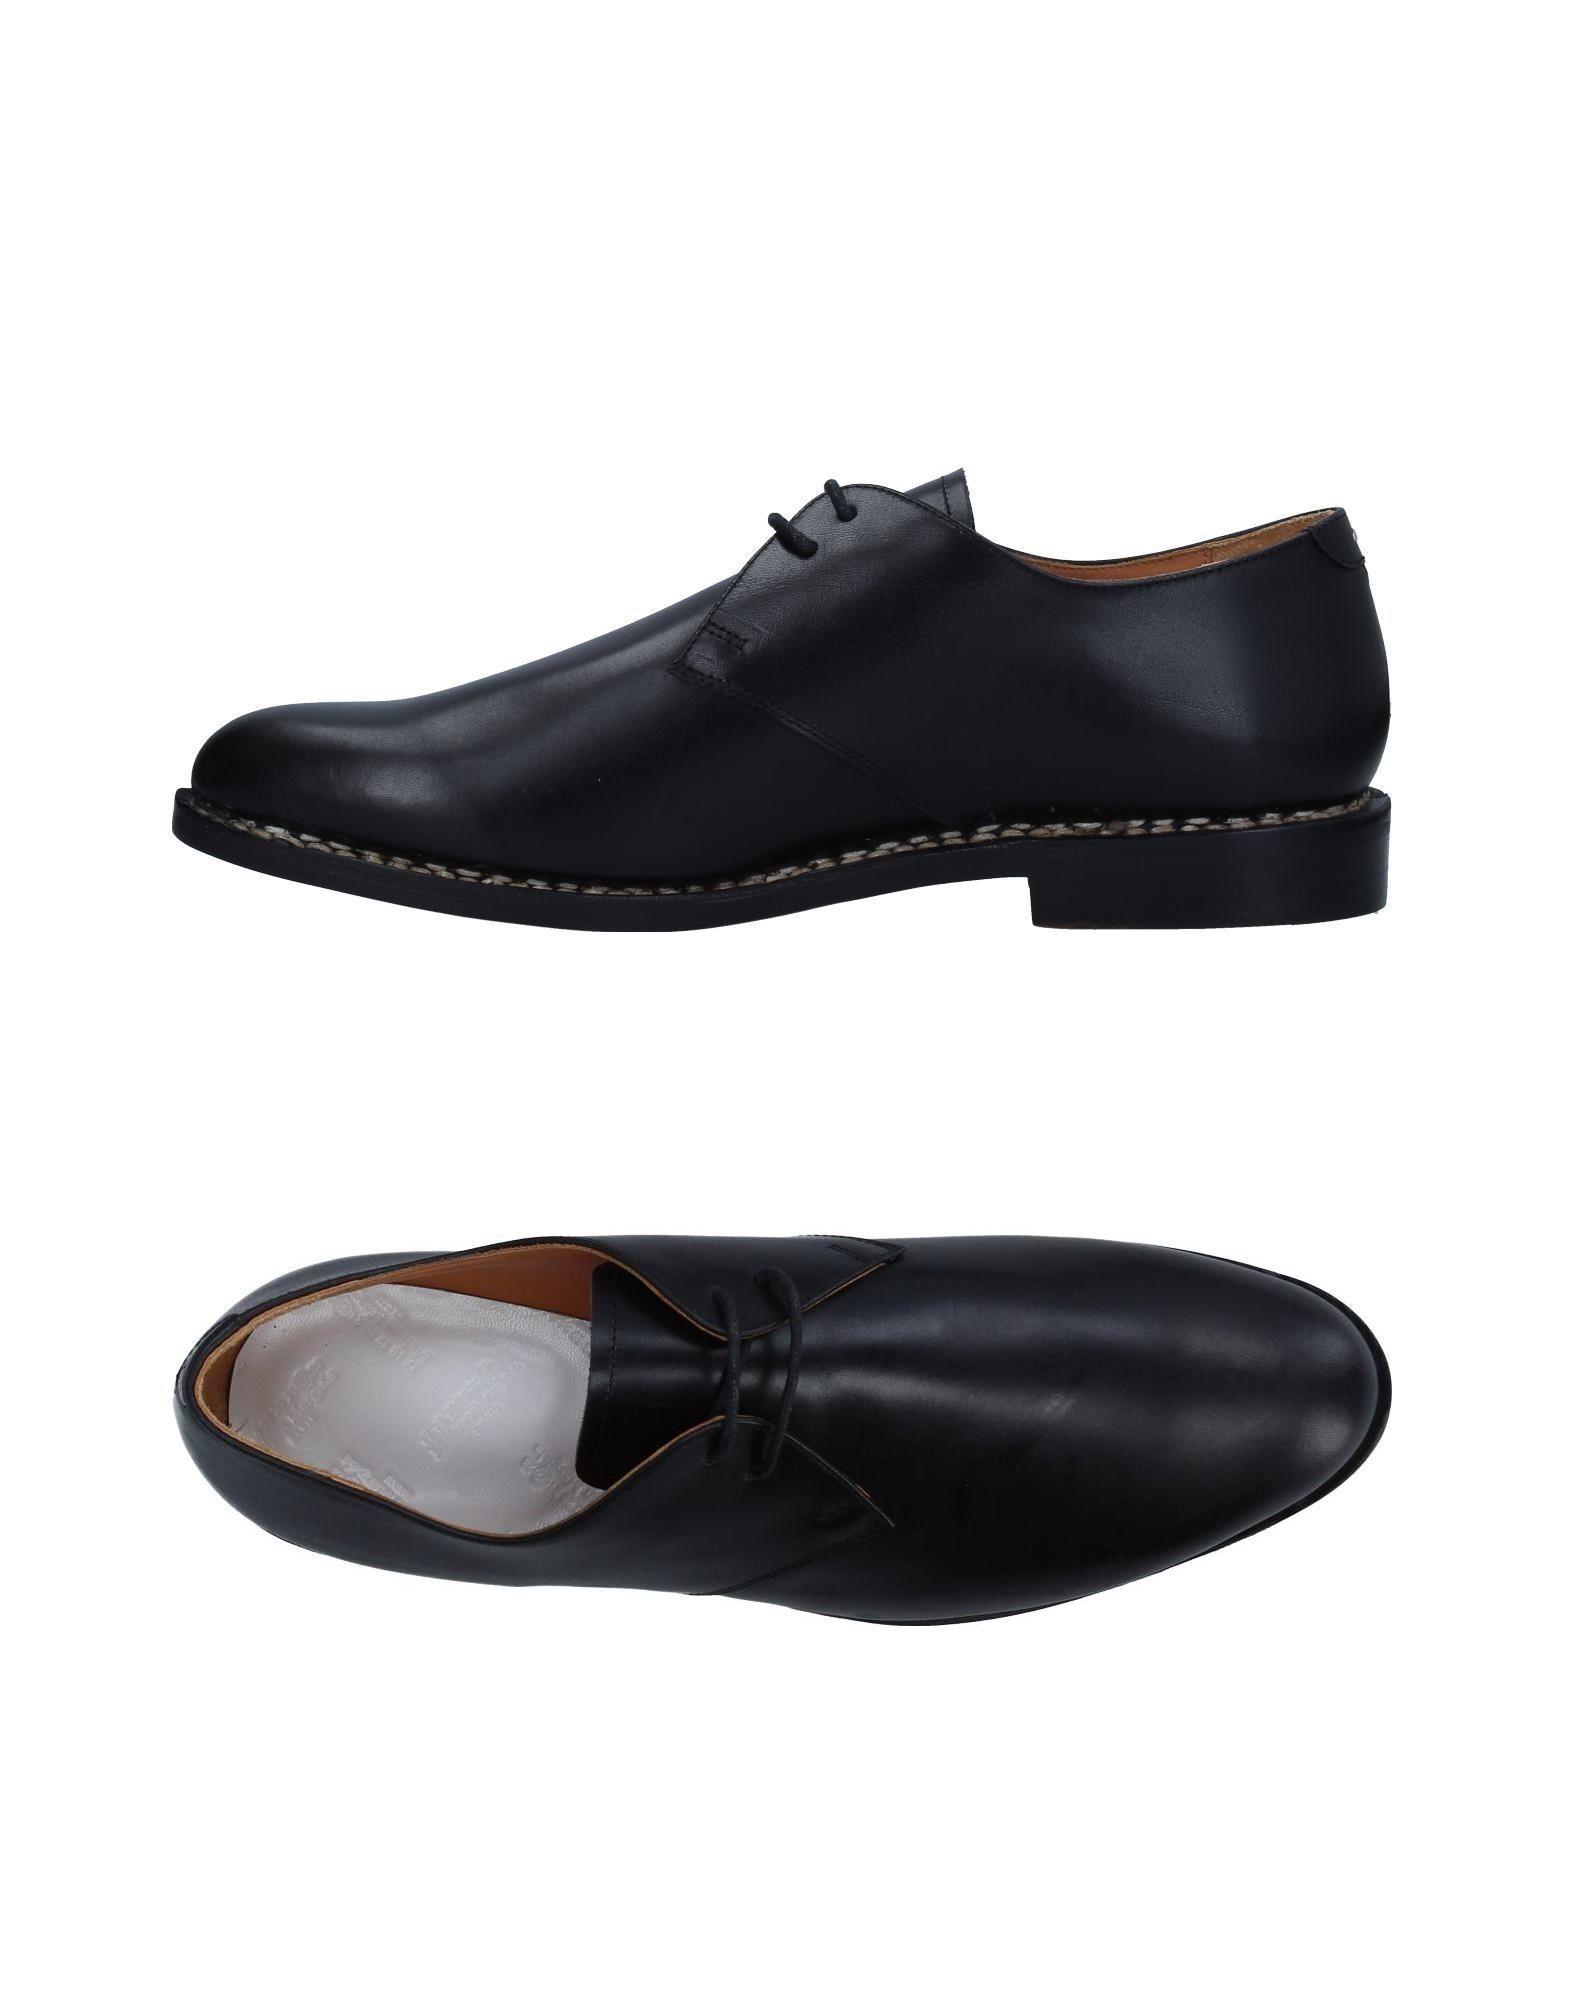 Maison Margiela Laced Shoes In Black